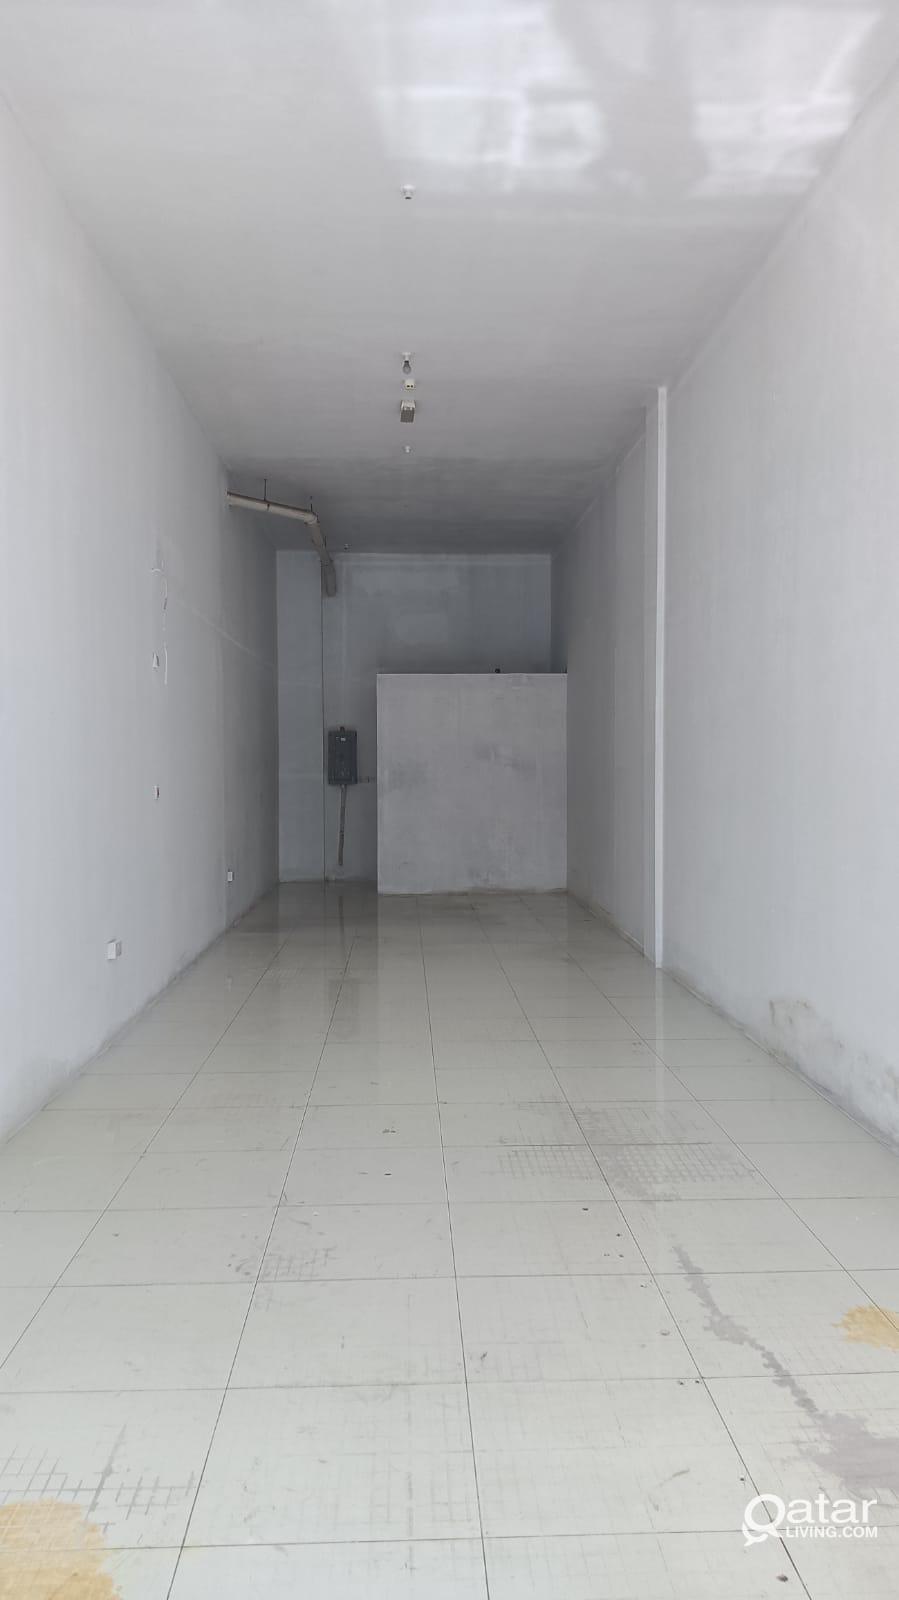 Shops for rent in Aziziya